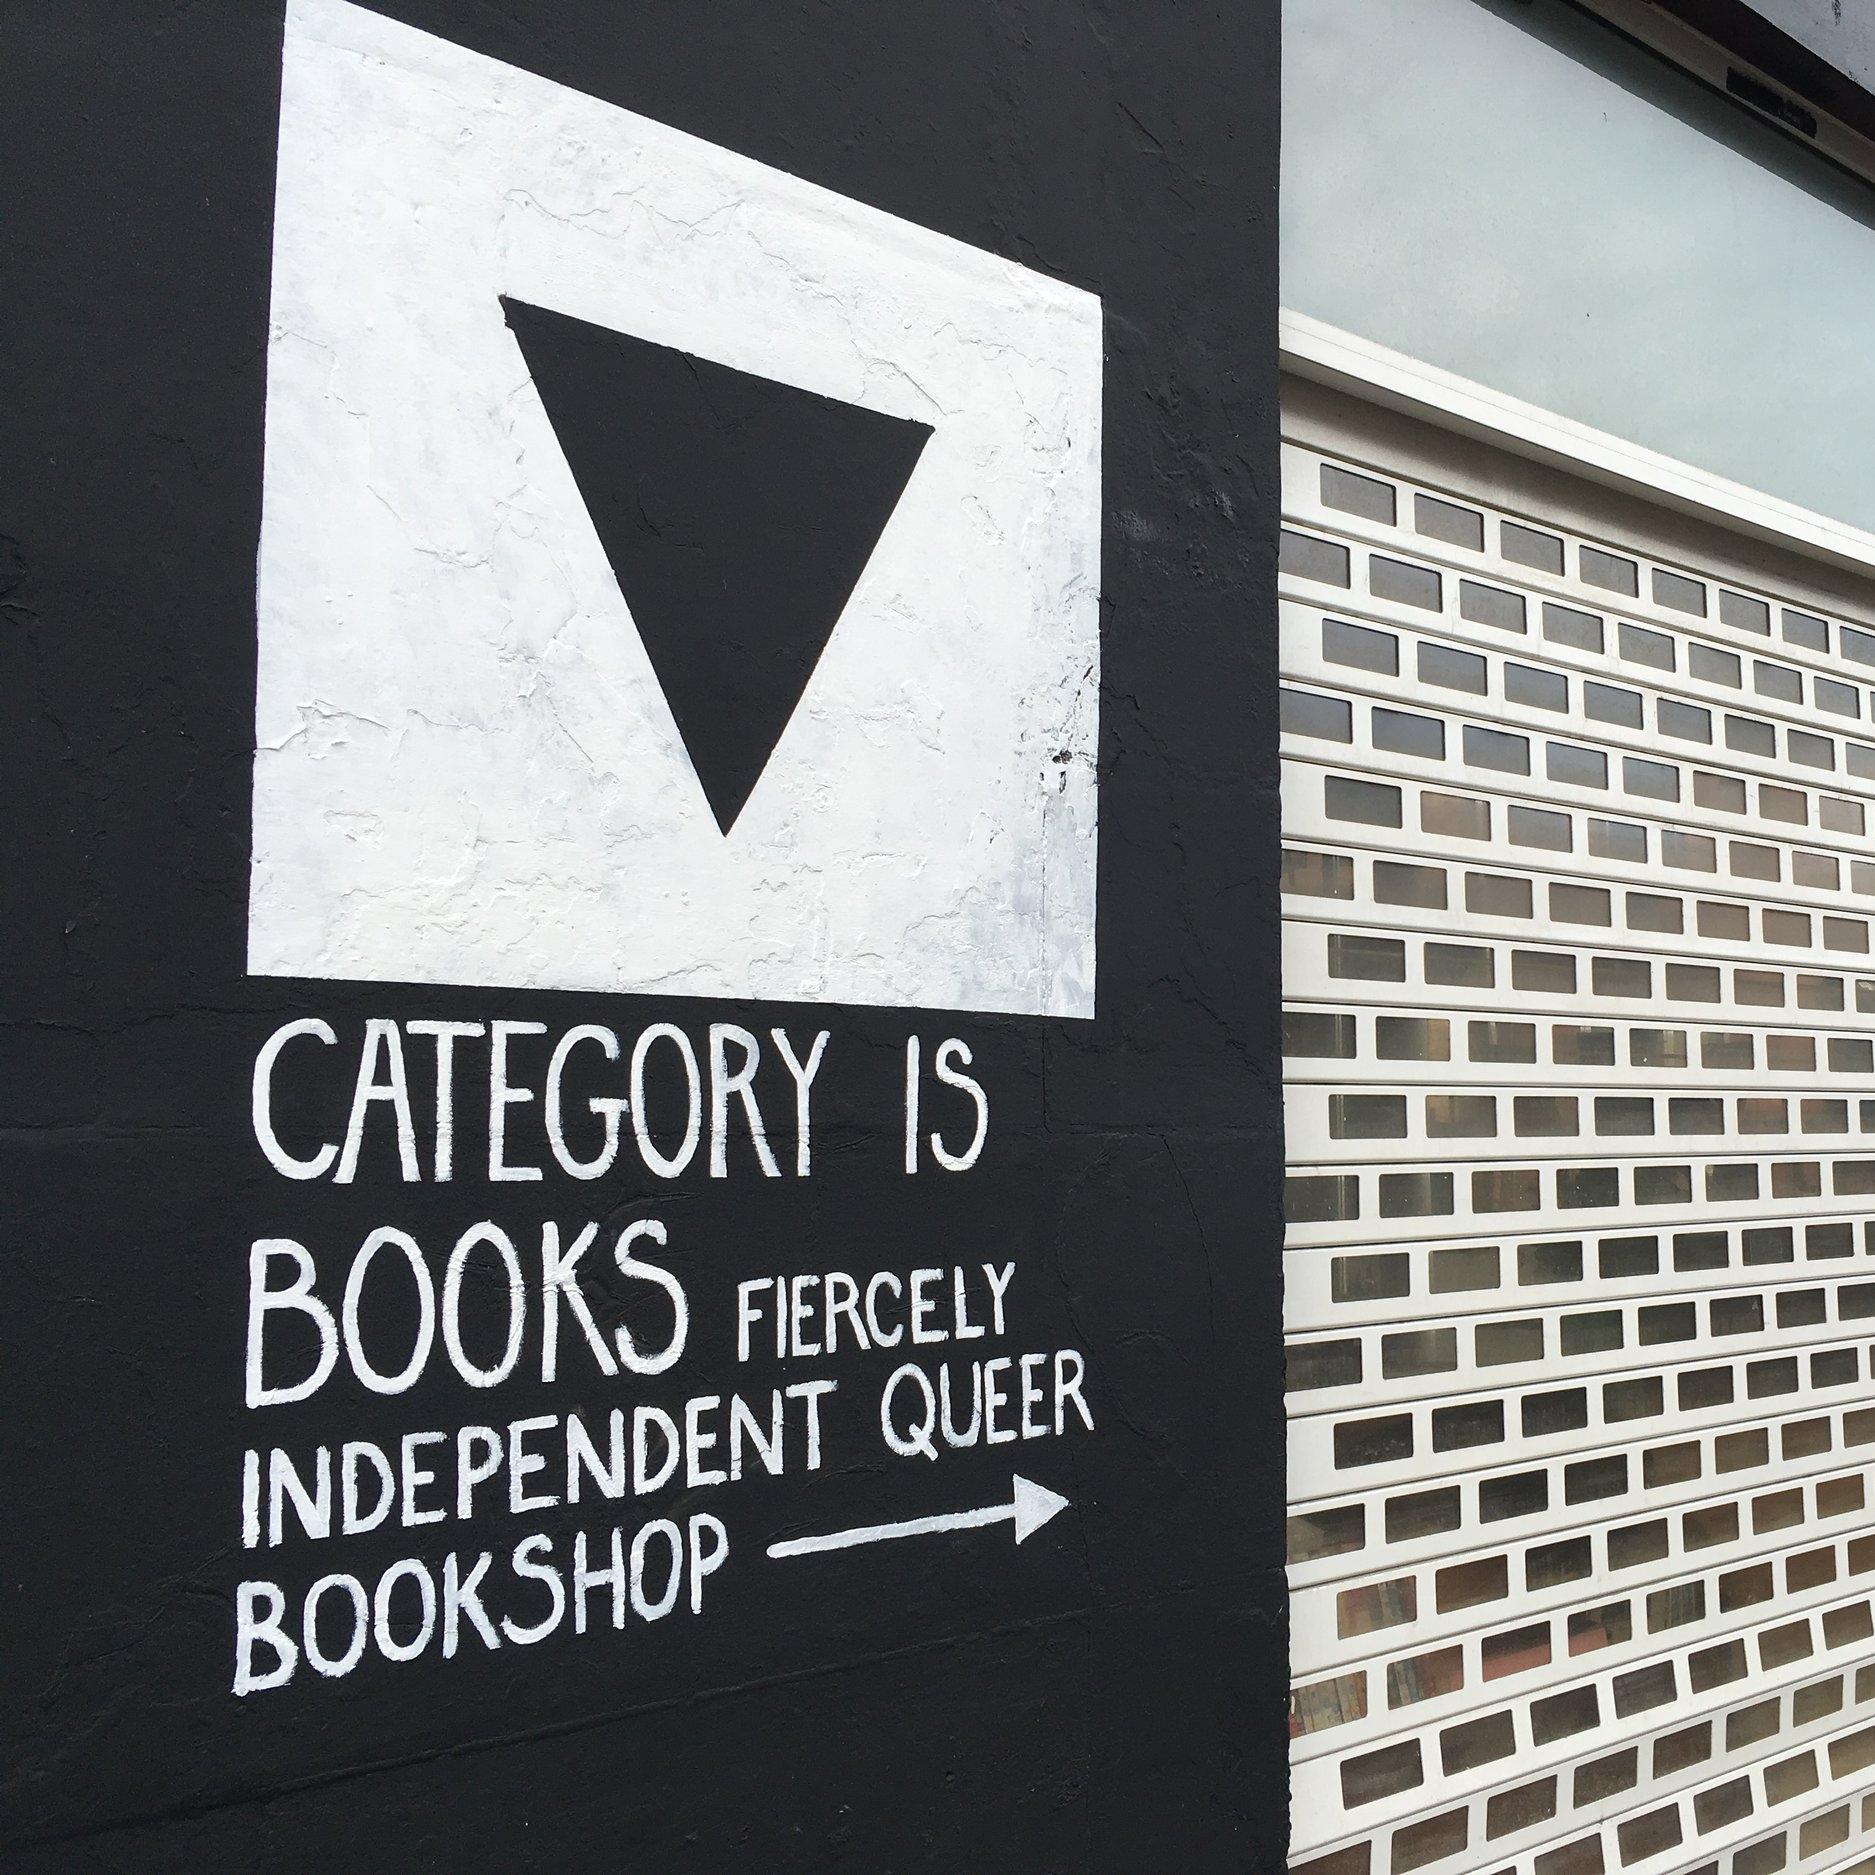 CategoryIsBooks_Shop.JPG